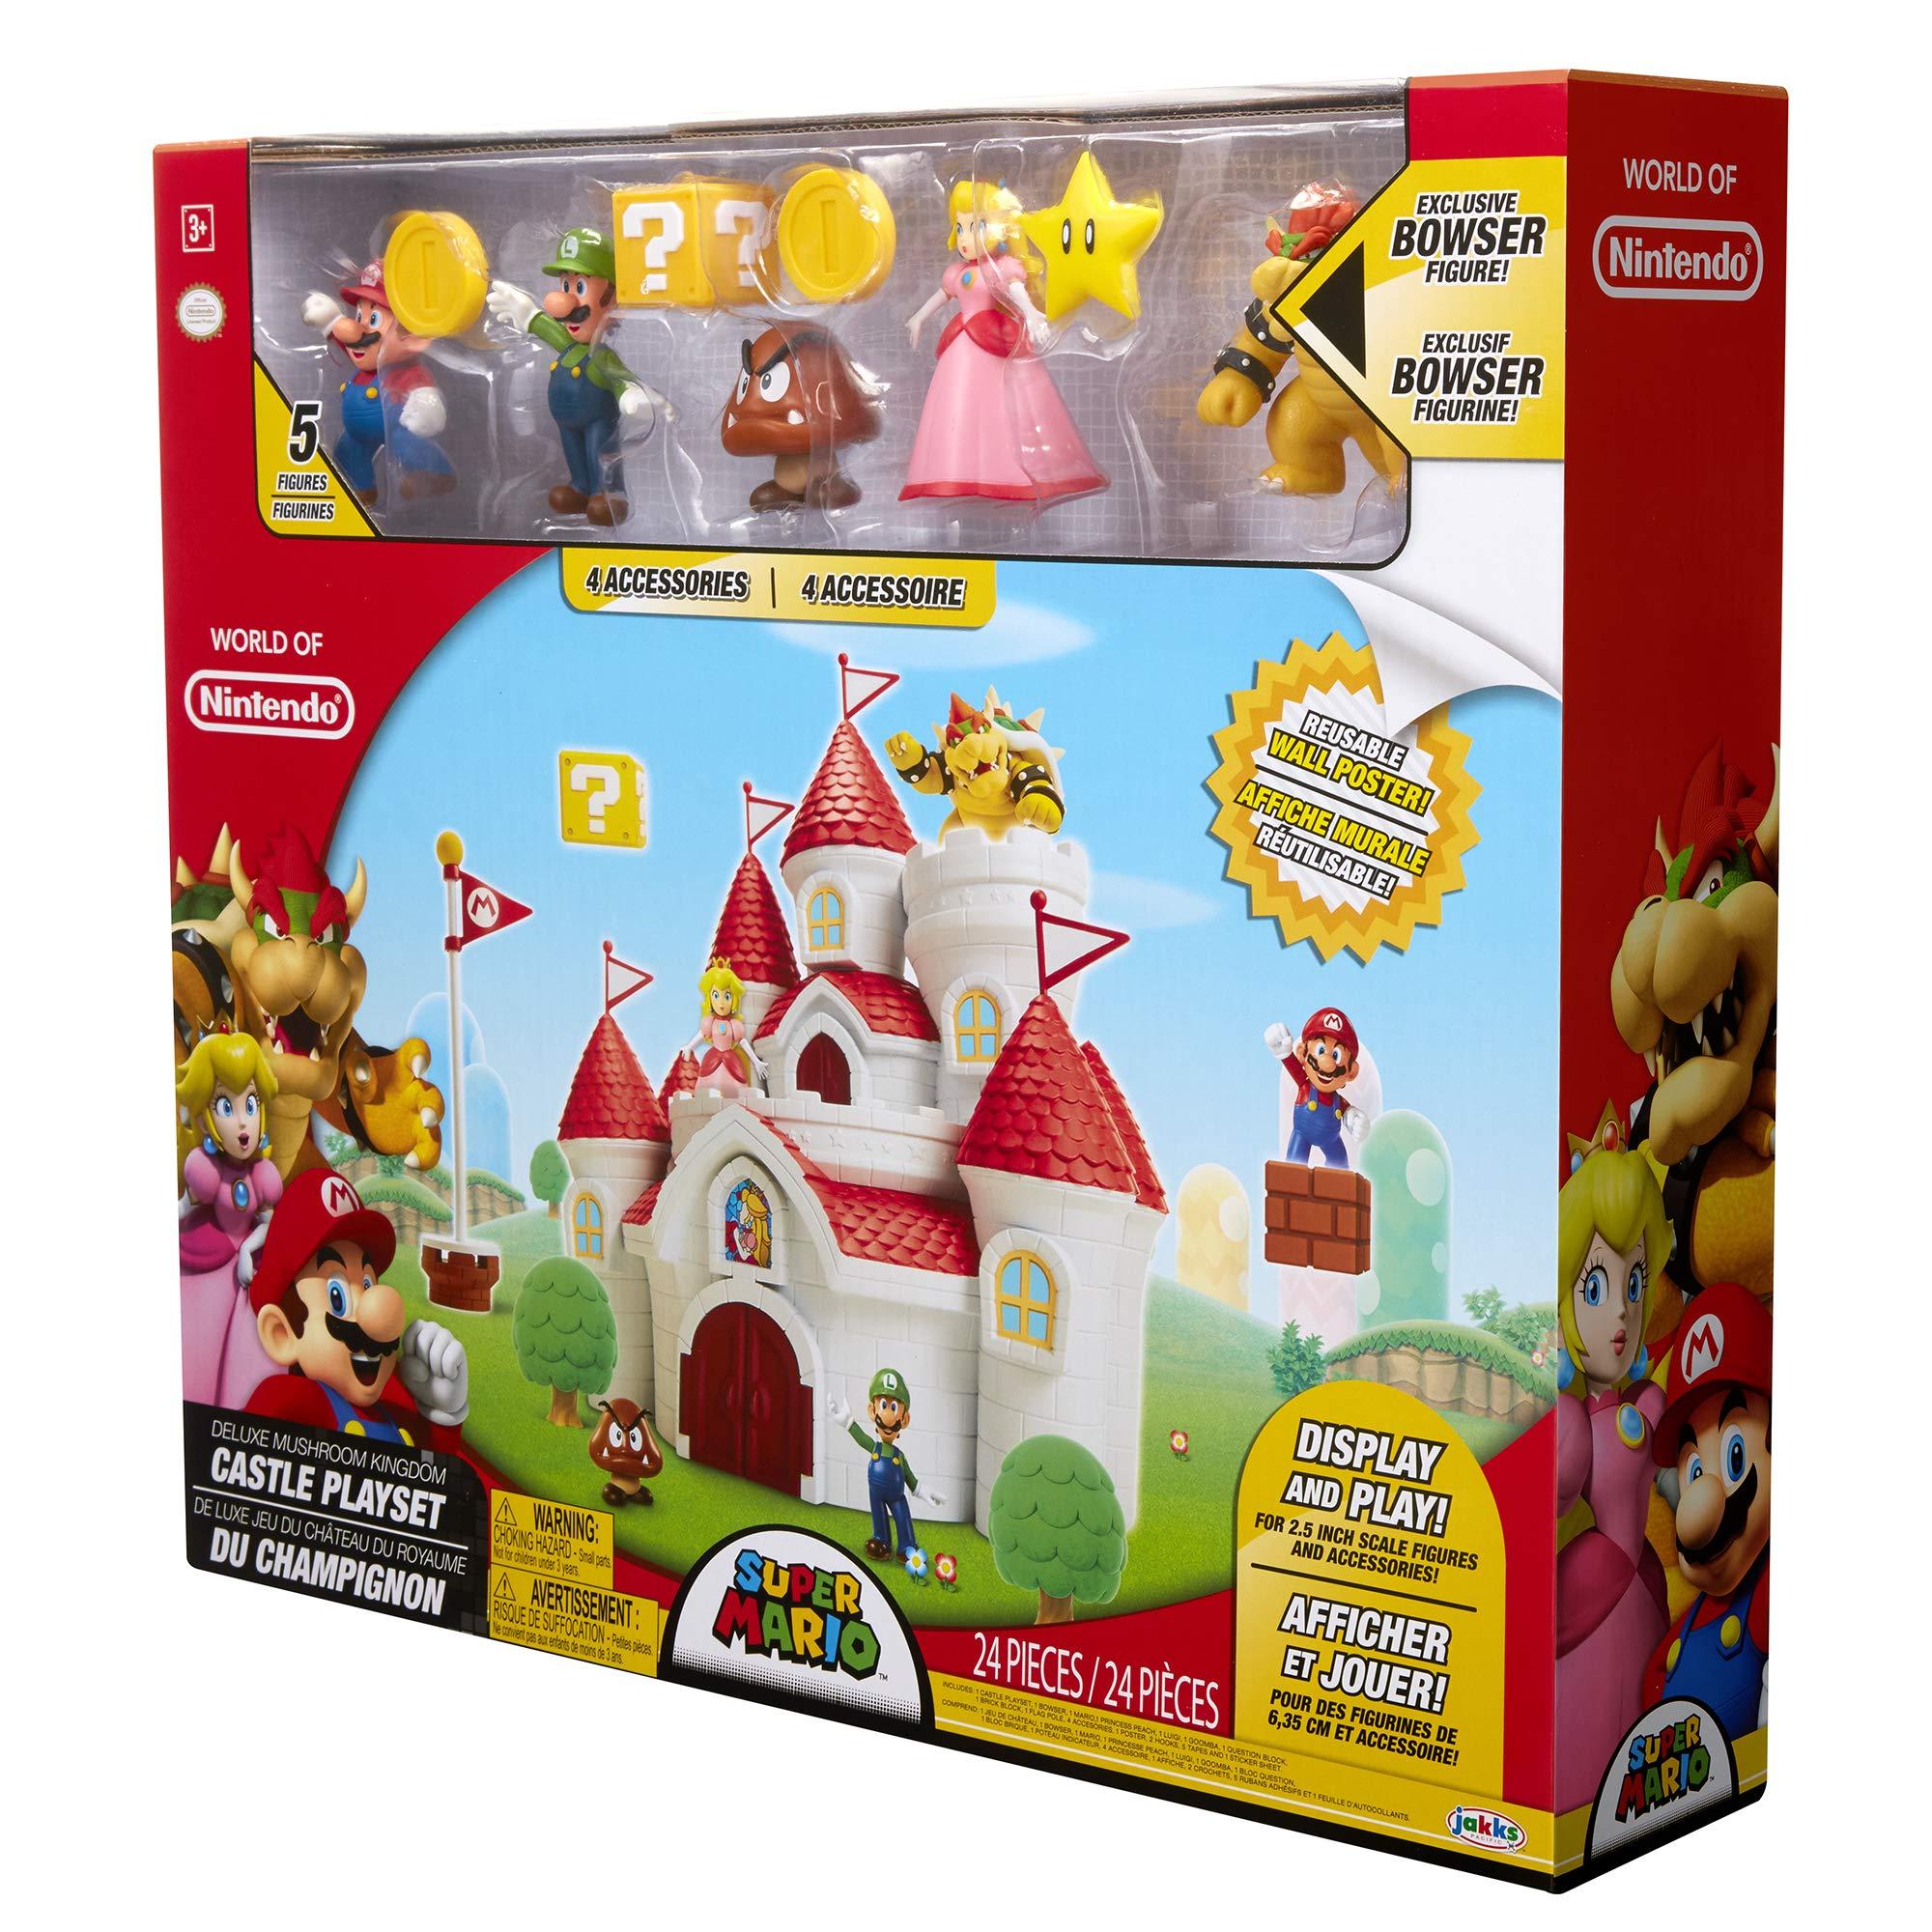 Nintendo Super Mario Deluxe Mushroom Kingdom Castle Playset with 5 Figures & 4 Accessories by Nintendo (Image #6)